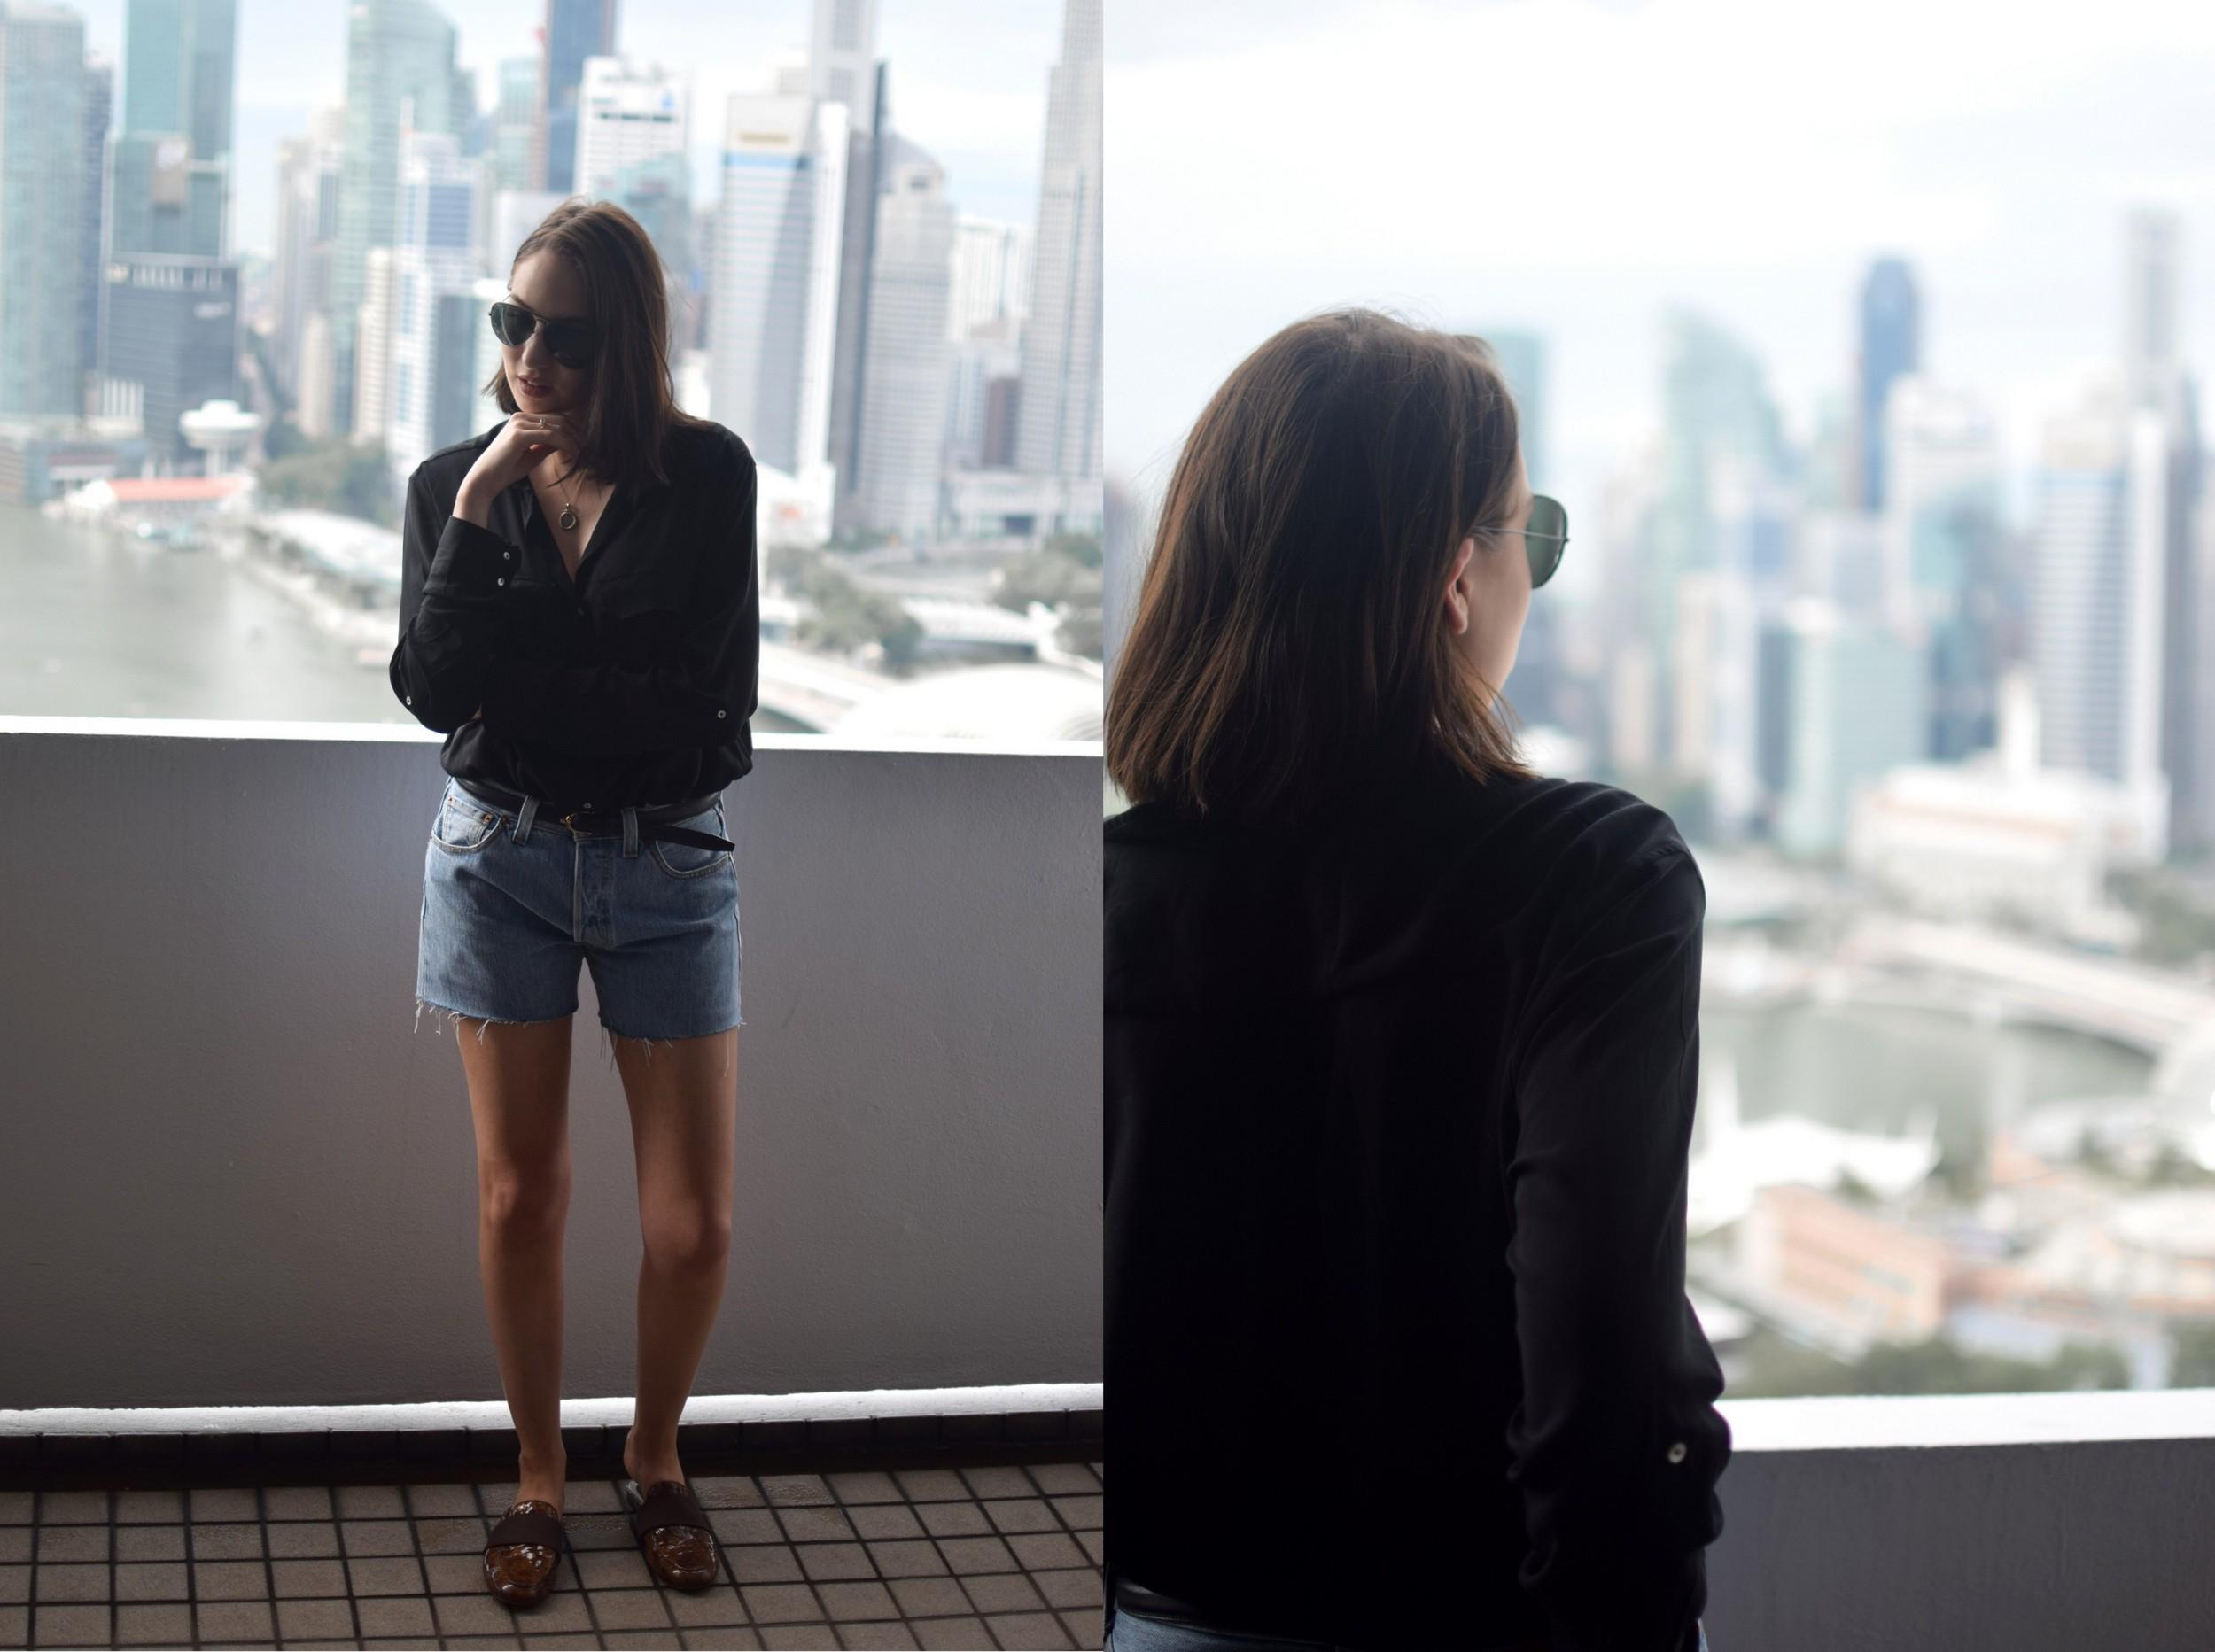 singapore1wdddd.jpg